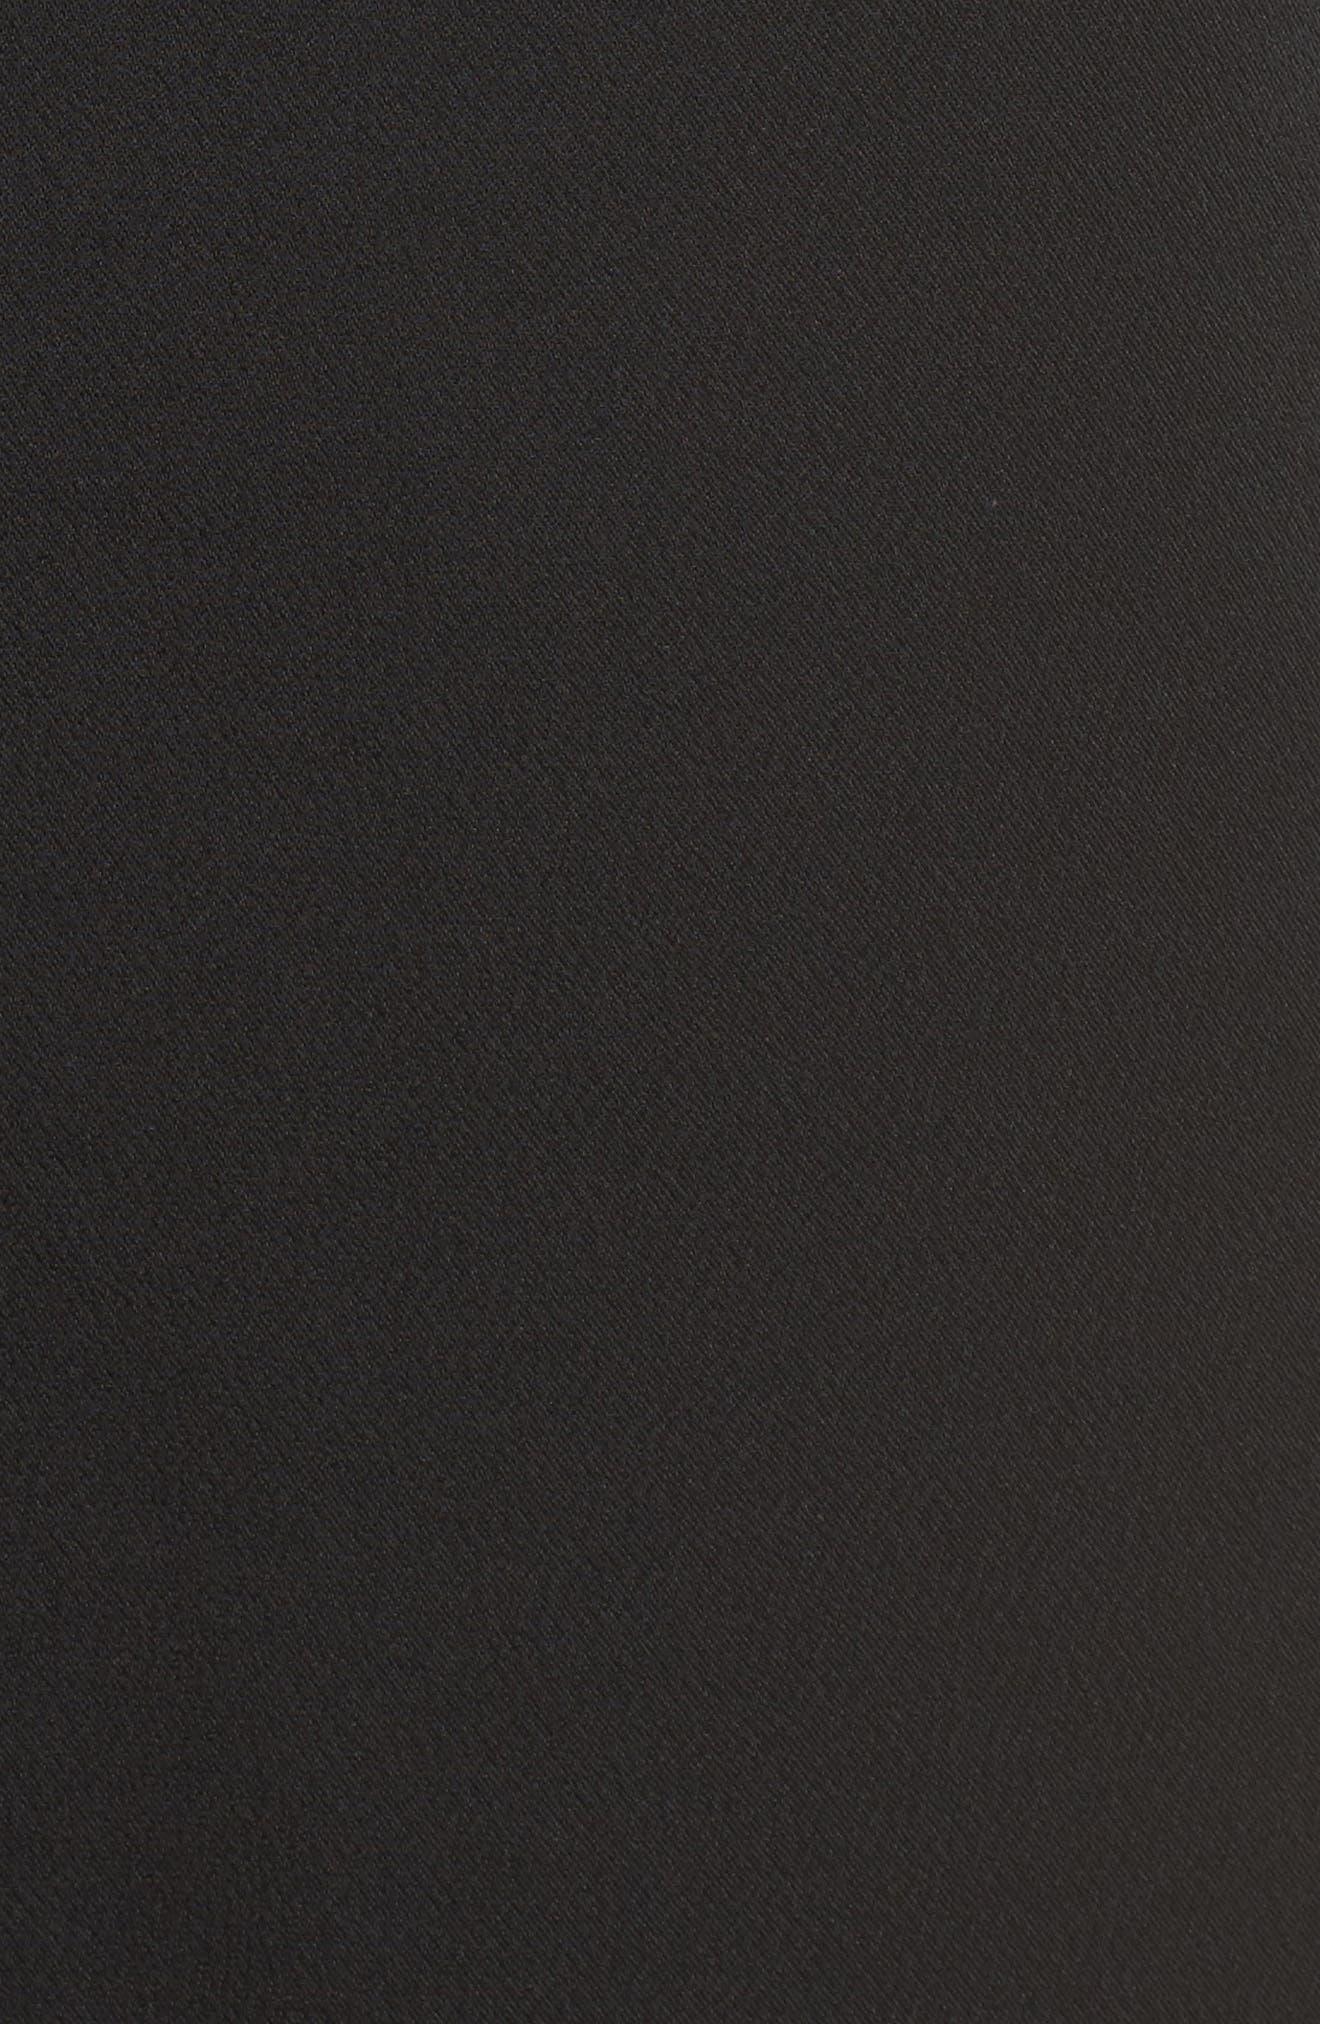 Heath Shift Dress,                             Alternate thumbnail 5, color,                             Black